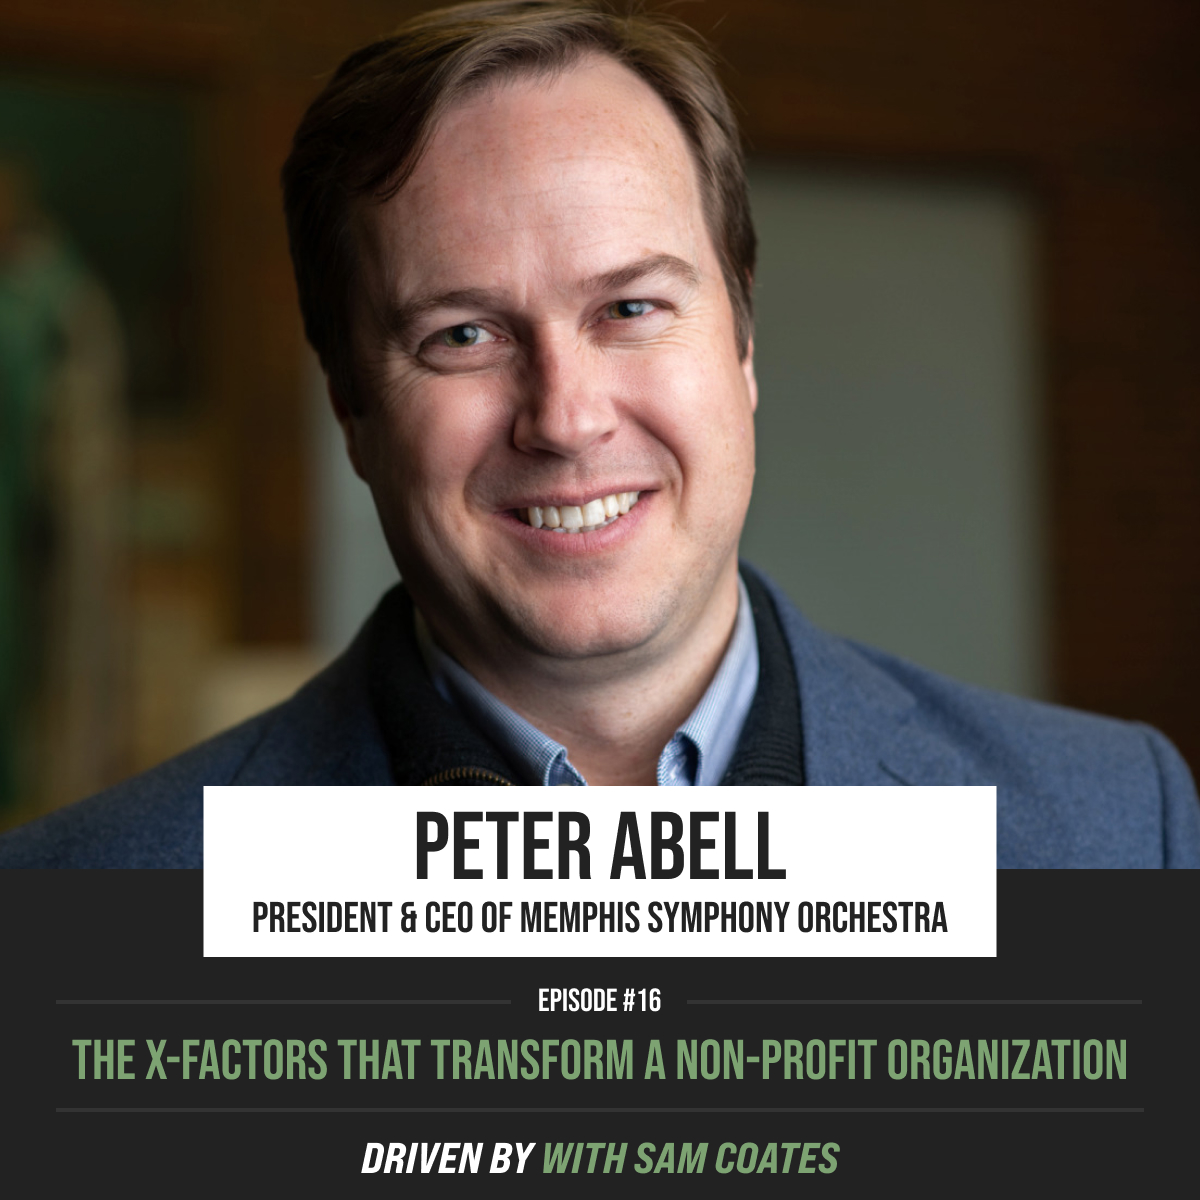 Peter Abell | The X-Factors That Transform a Non-Profit Organization